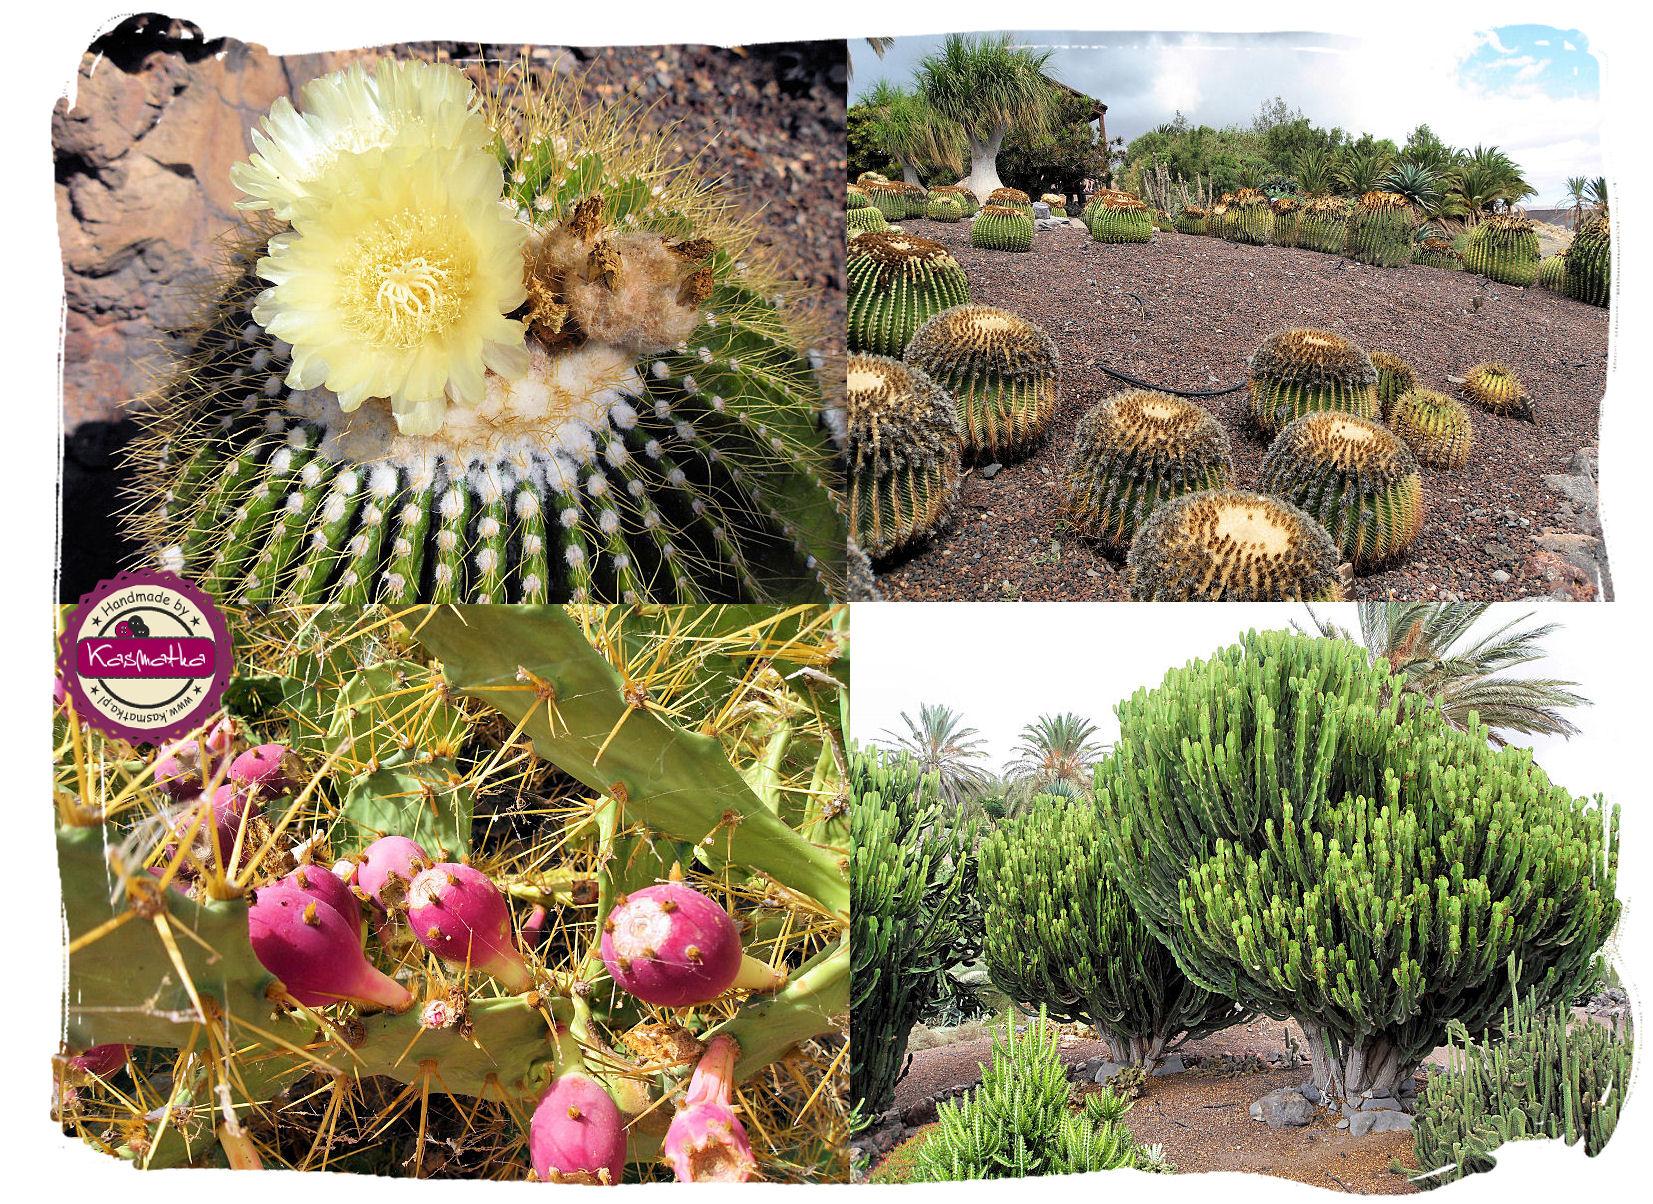 oasis park kaktusy kolaz